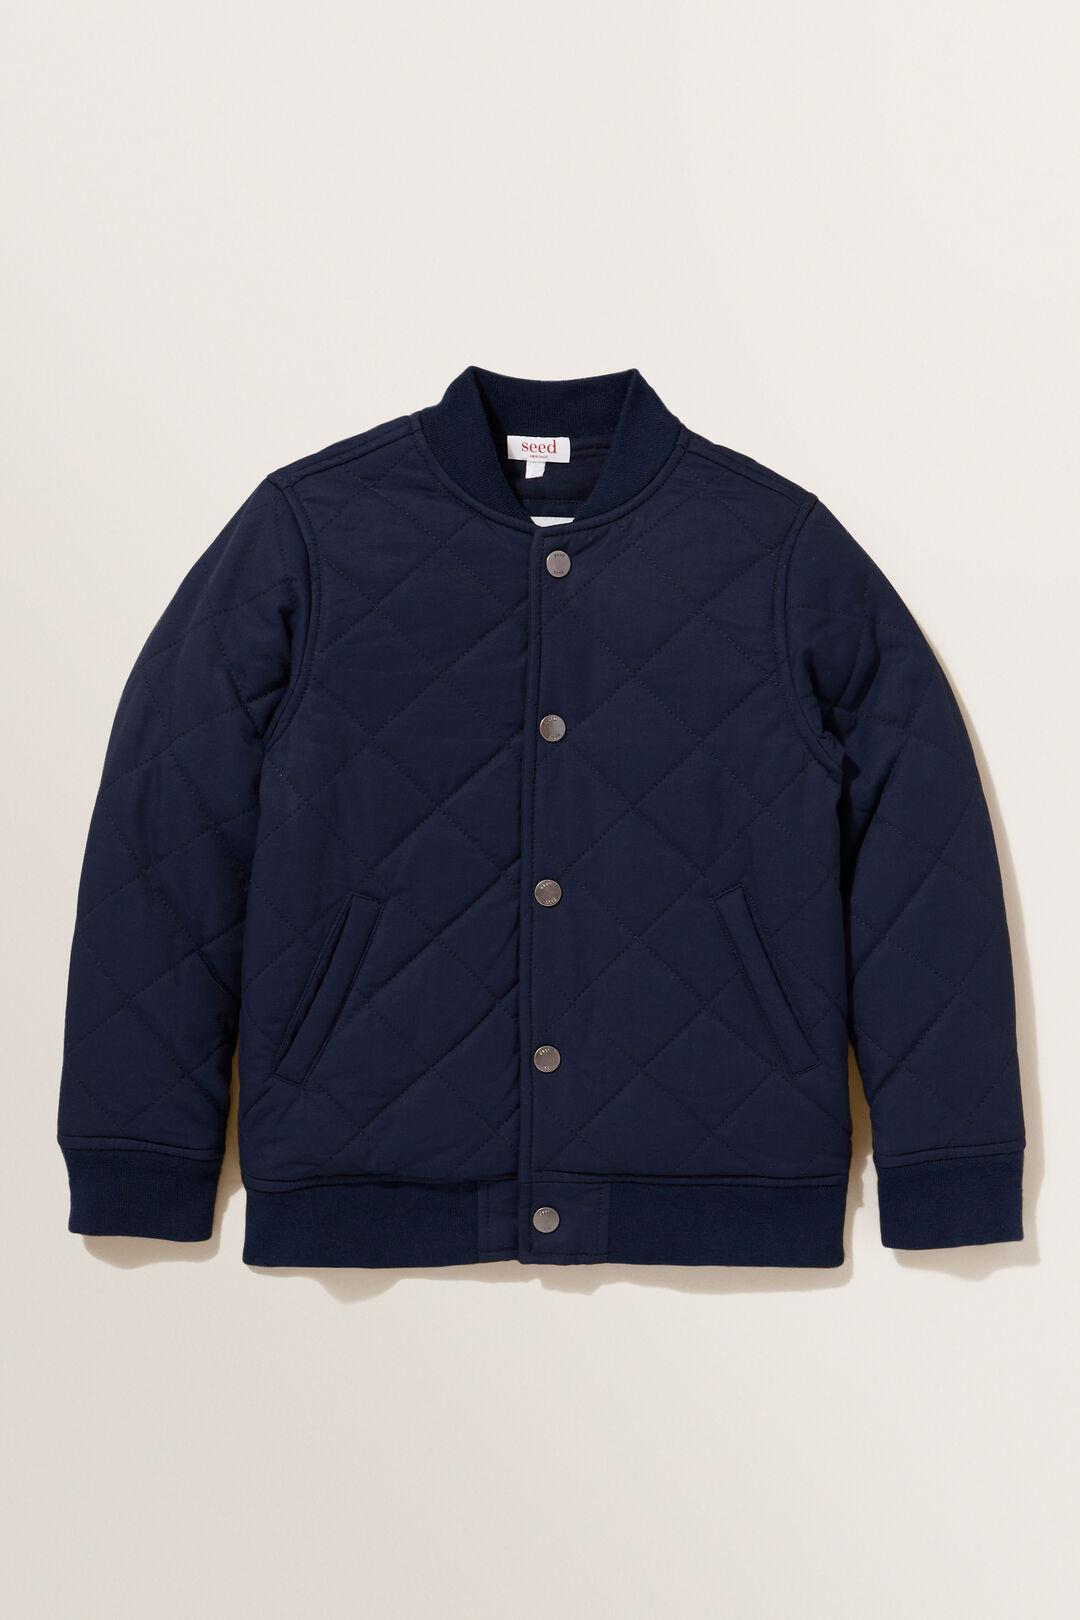 Snap Front Bomber Jacket  MIDNIGHT BLUE  hi-res